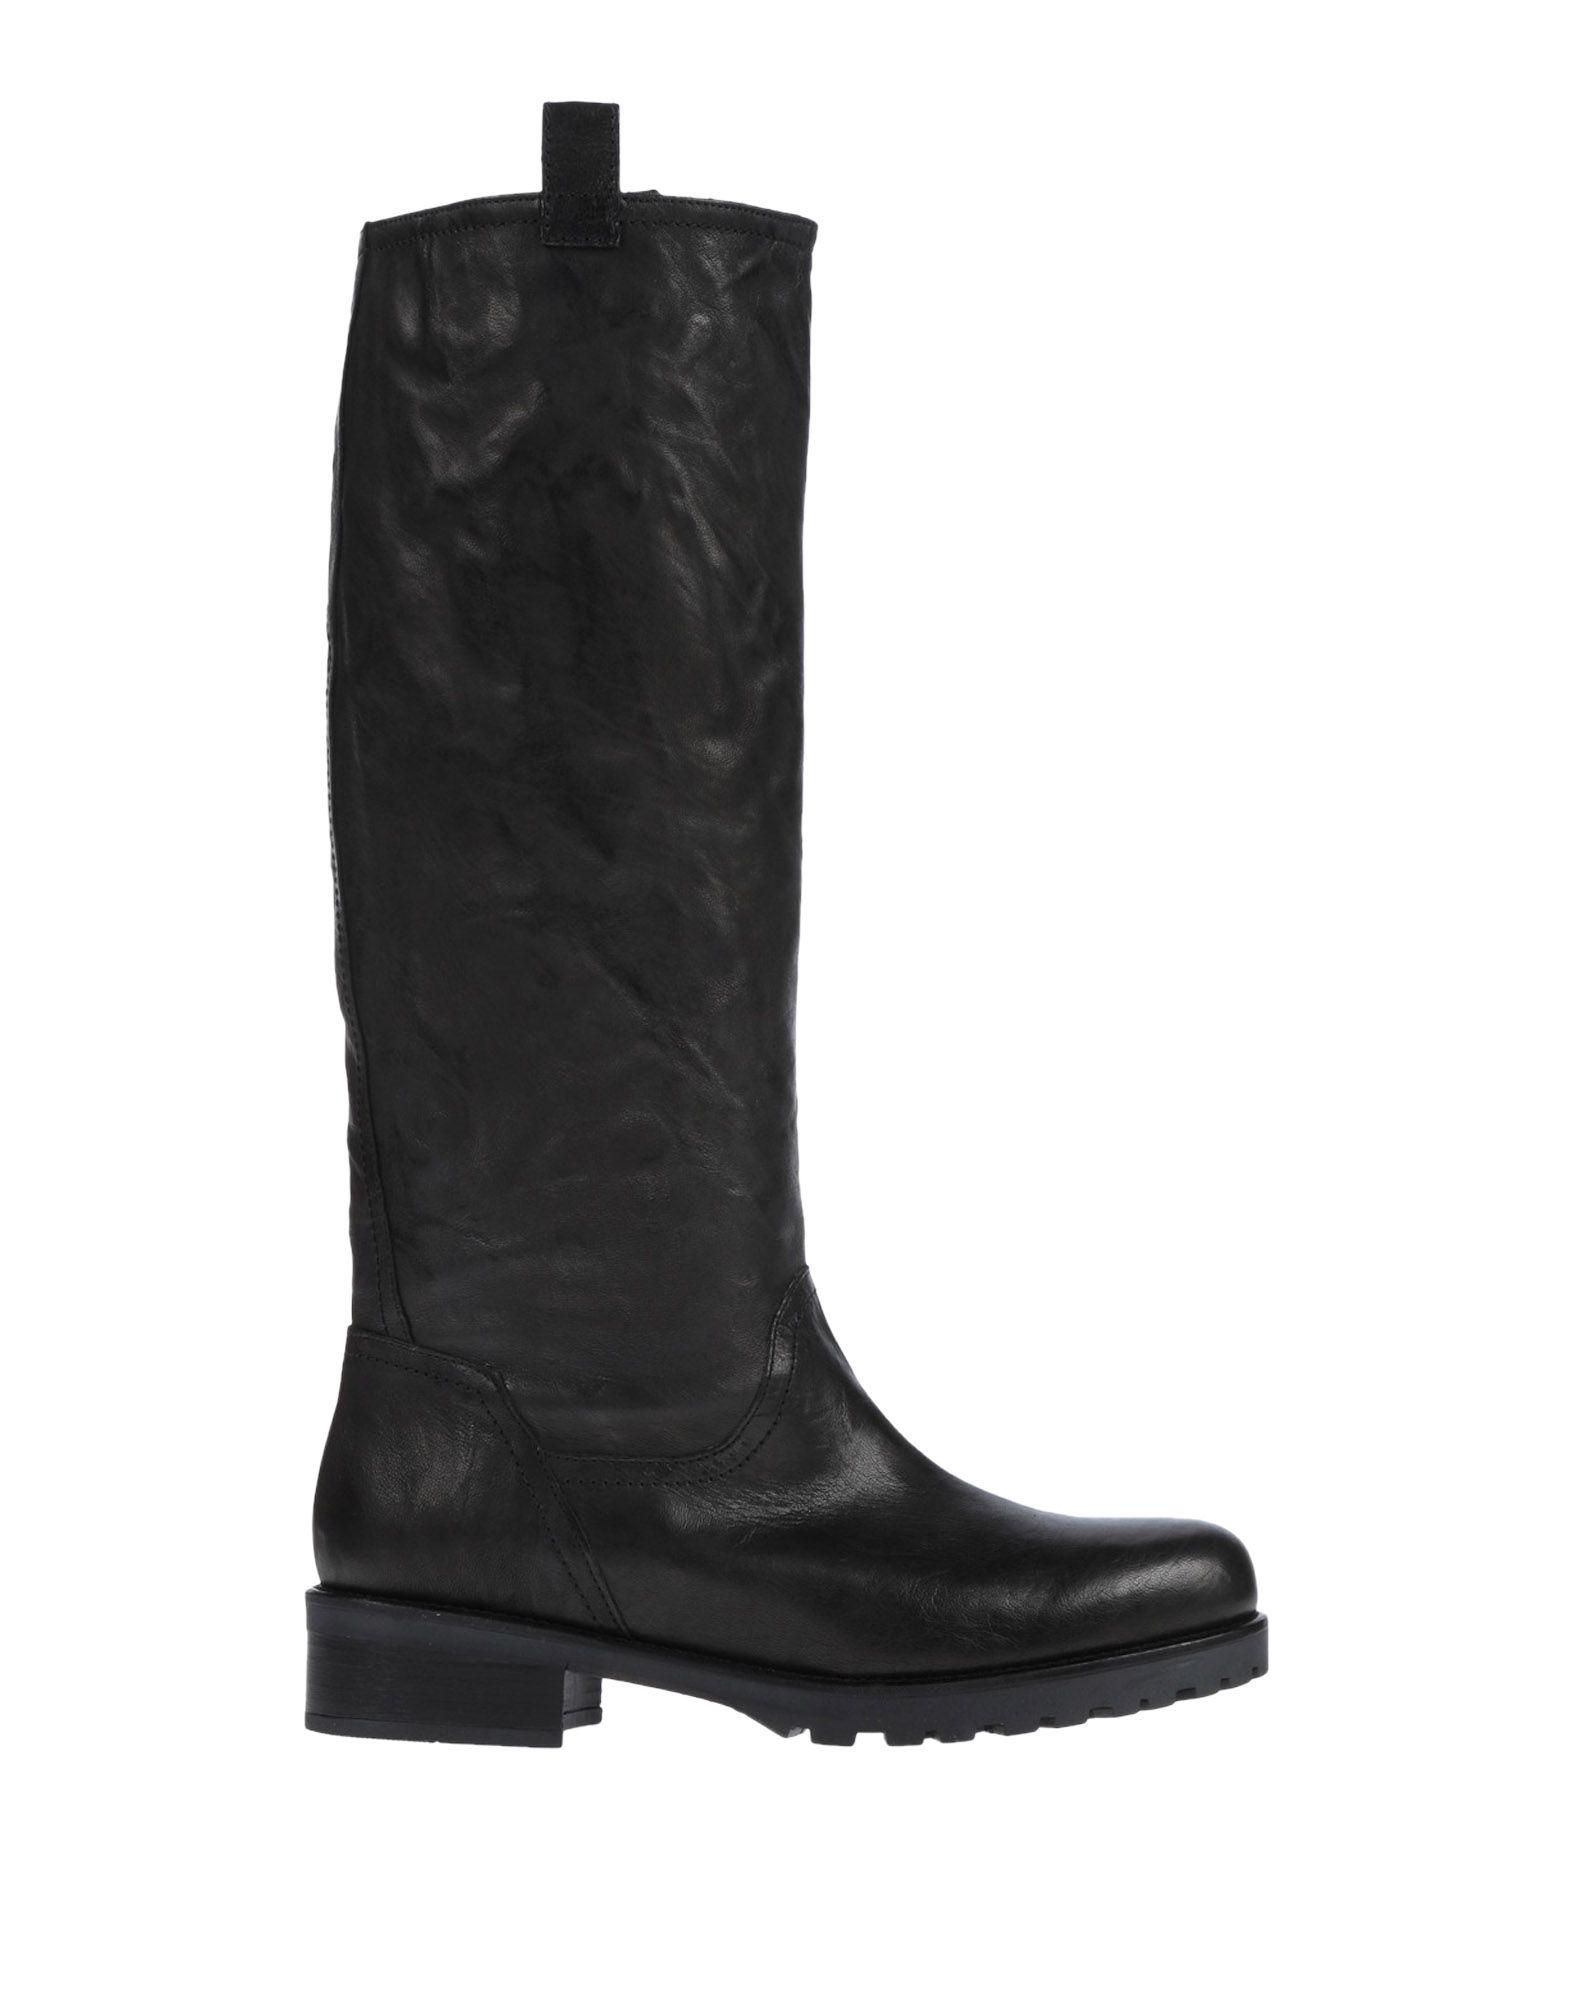 Patrizia Pepe Boots - Women Patrizia Pepe Australia Boots online on  Australia Pepe - 11523385BB a458ab